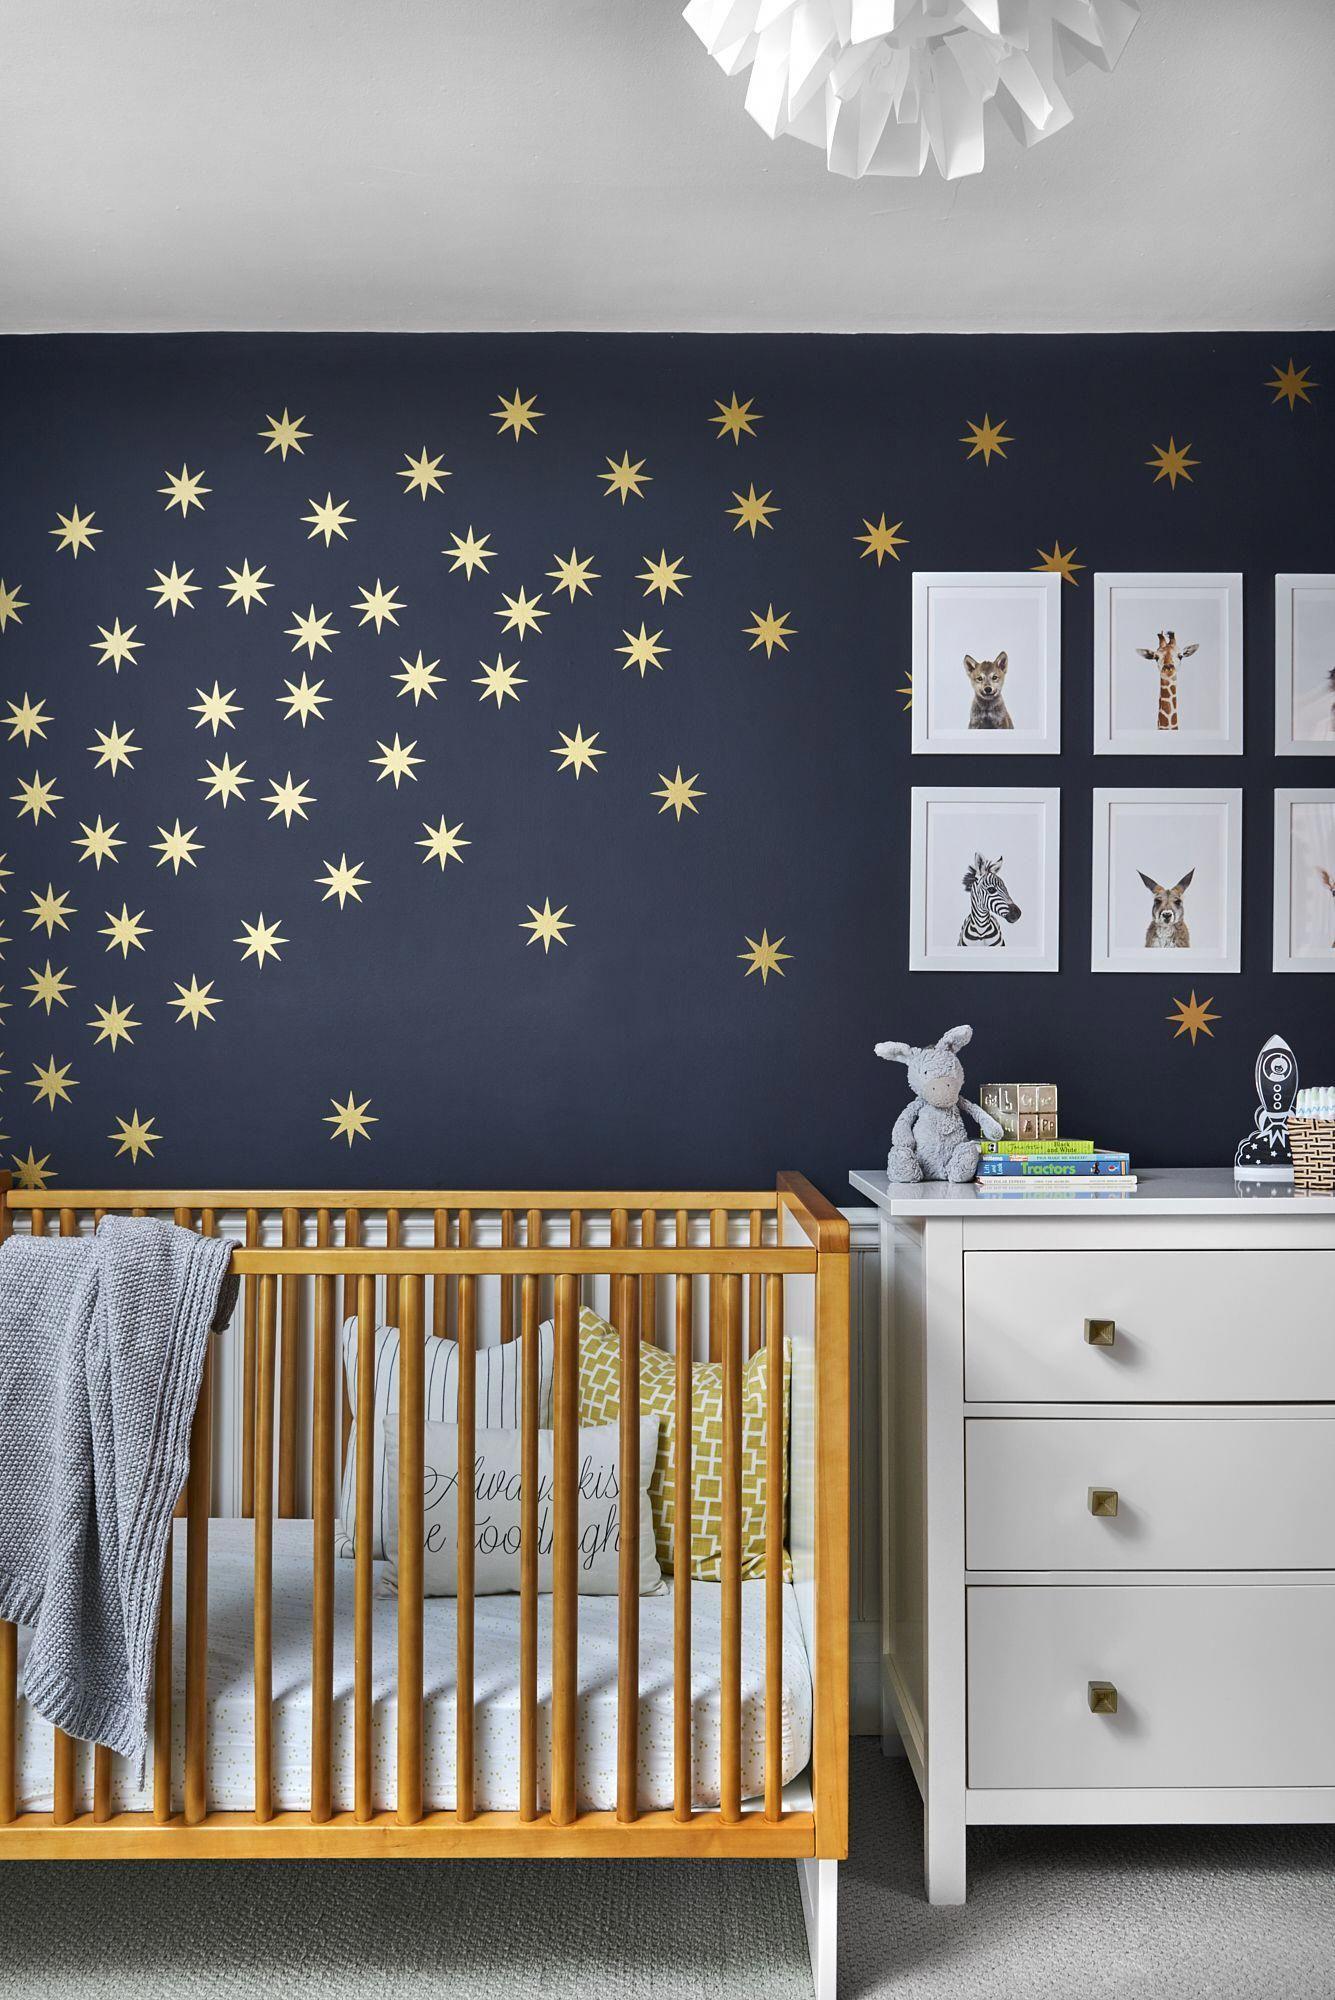 Amazing Boy Nursery: This Amazing Boho Nursery Is An Obviously Inspirational